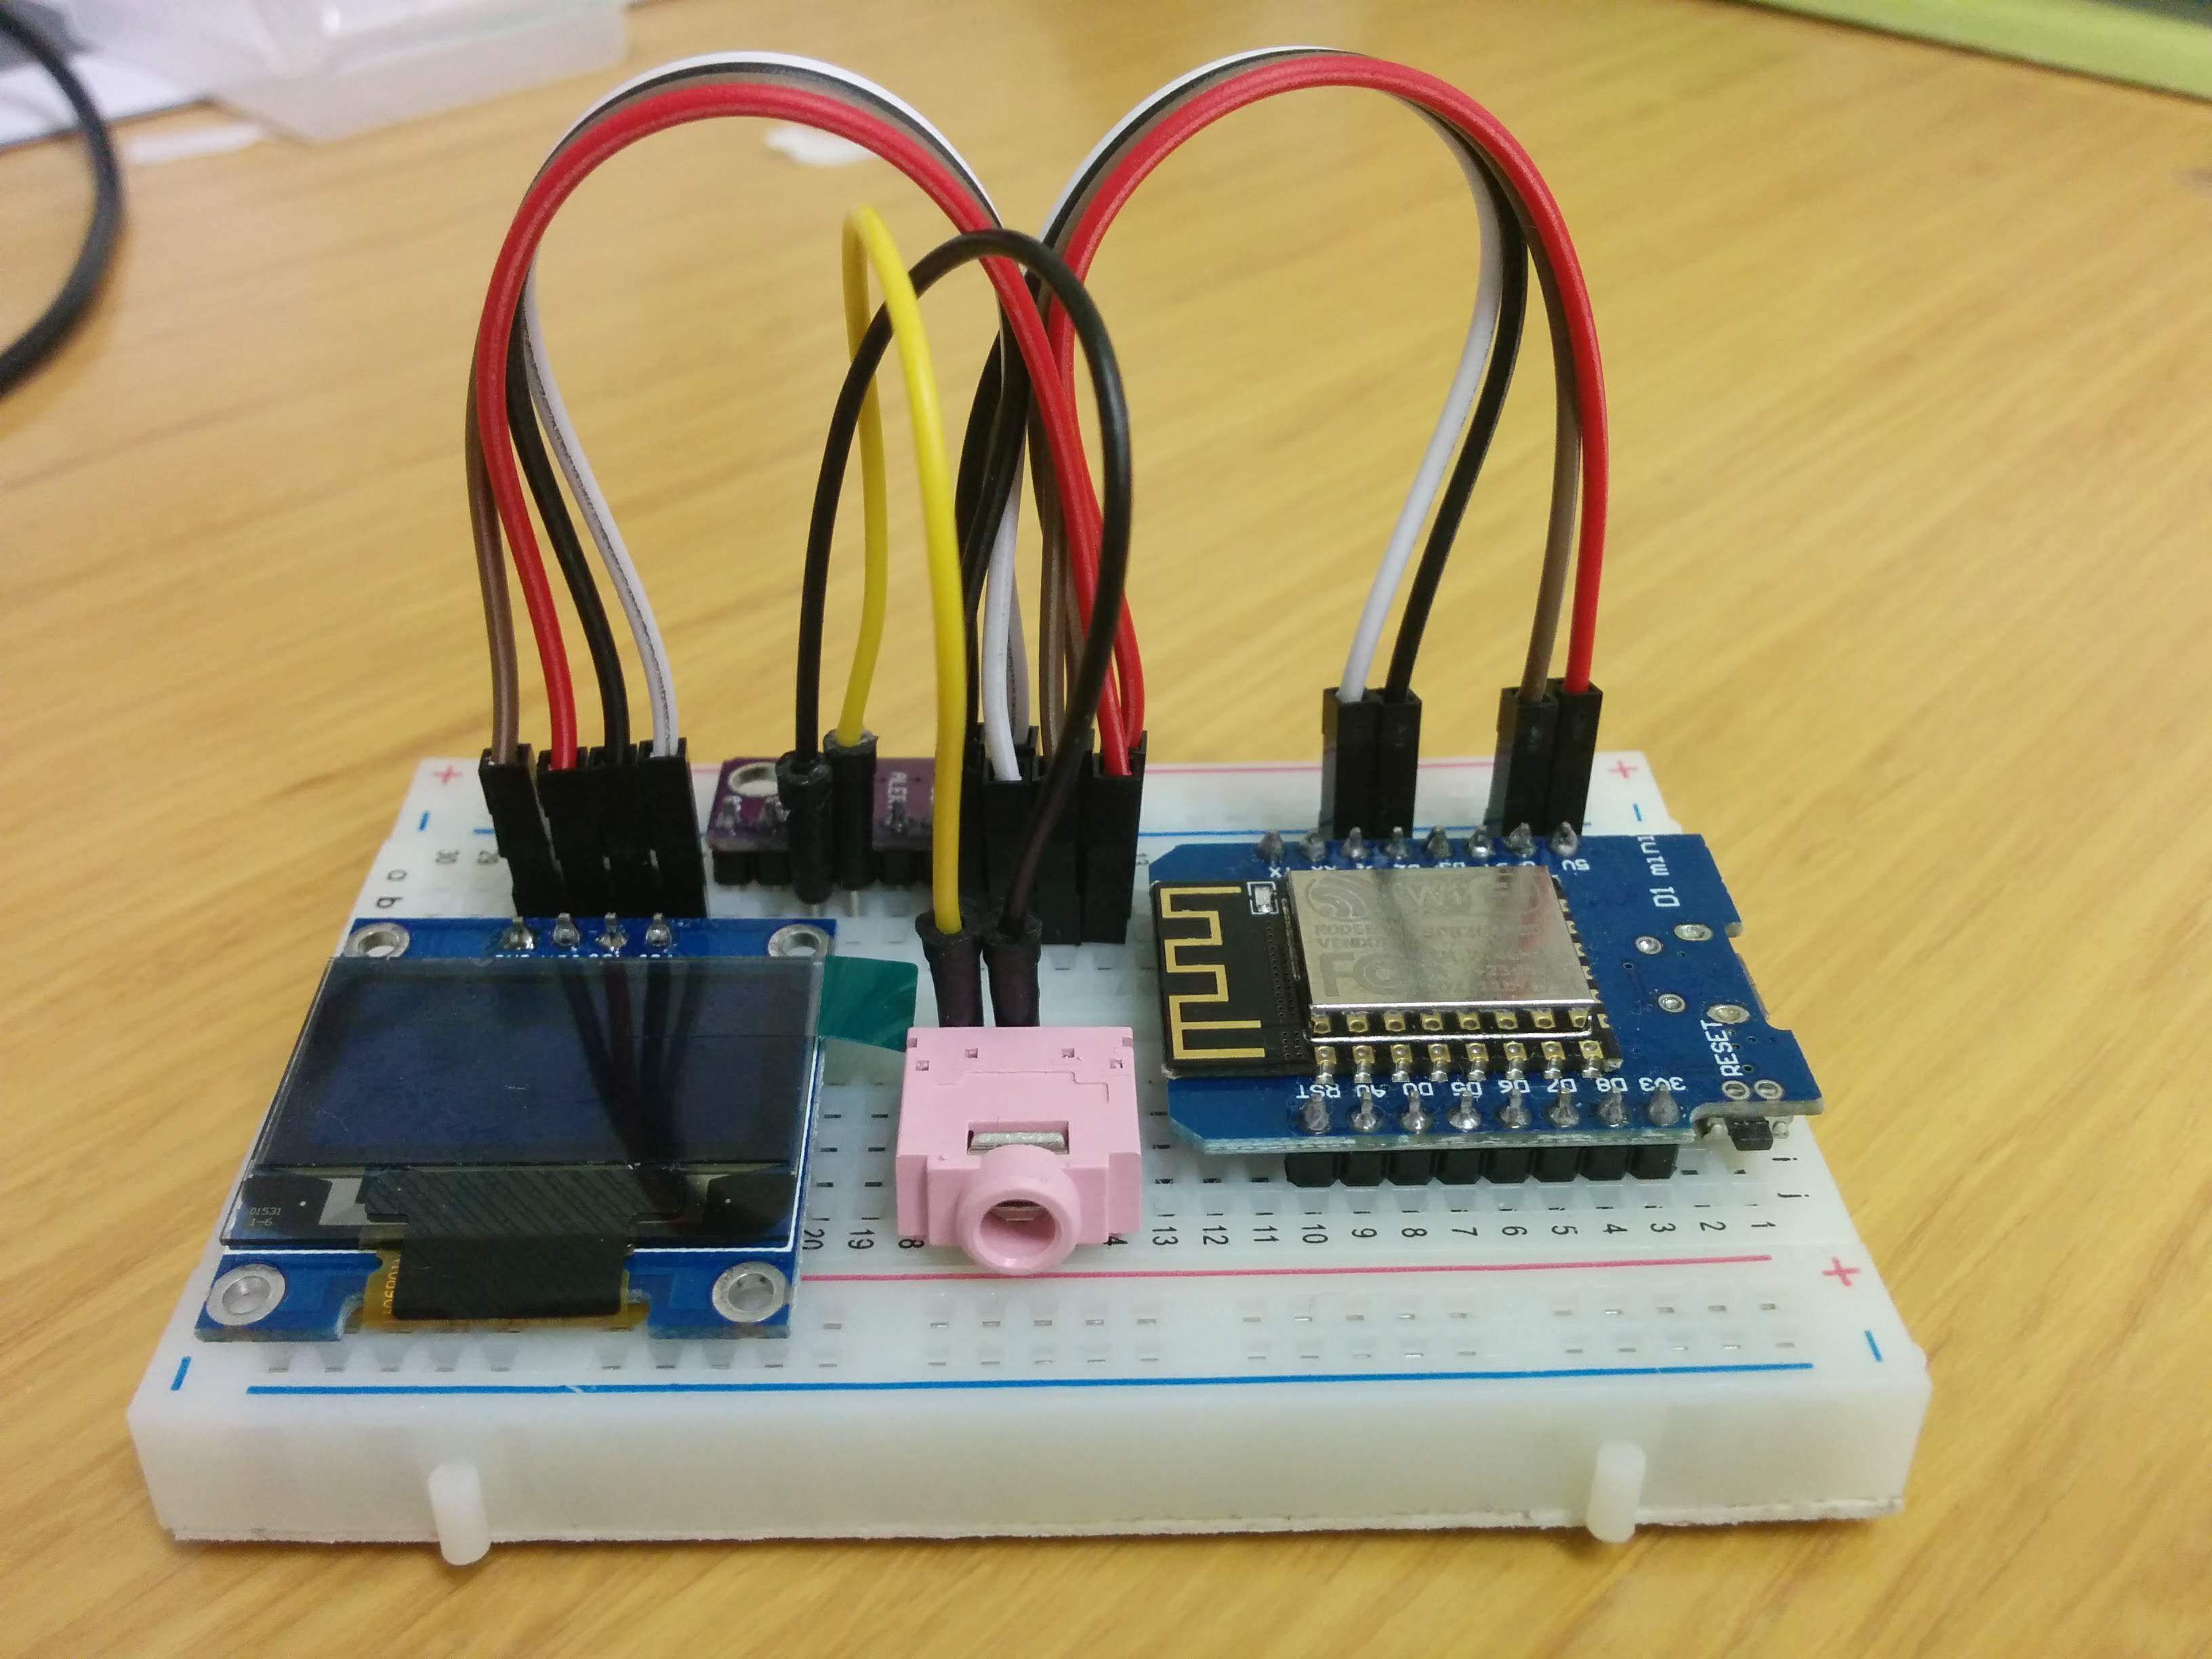 WeMos D1 Mini (b) sersor | Learn IoT with Arduino & ESP8266 Device